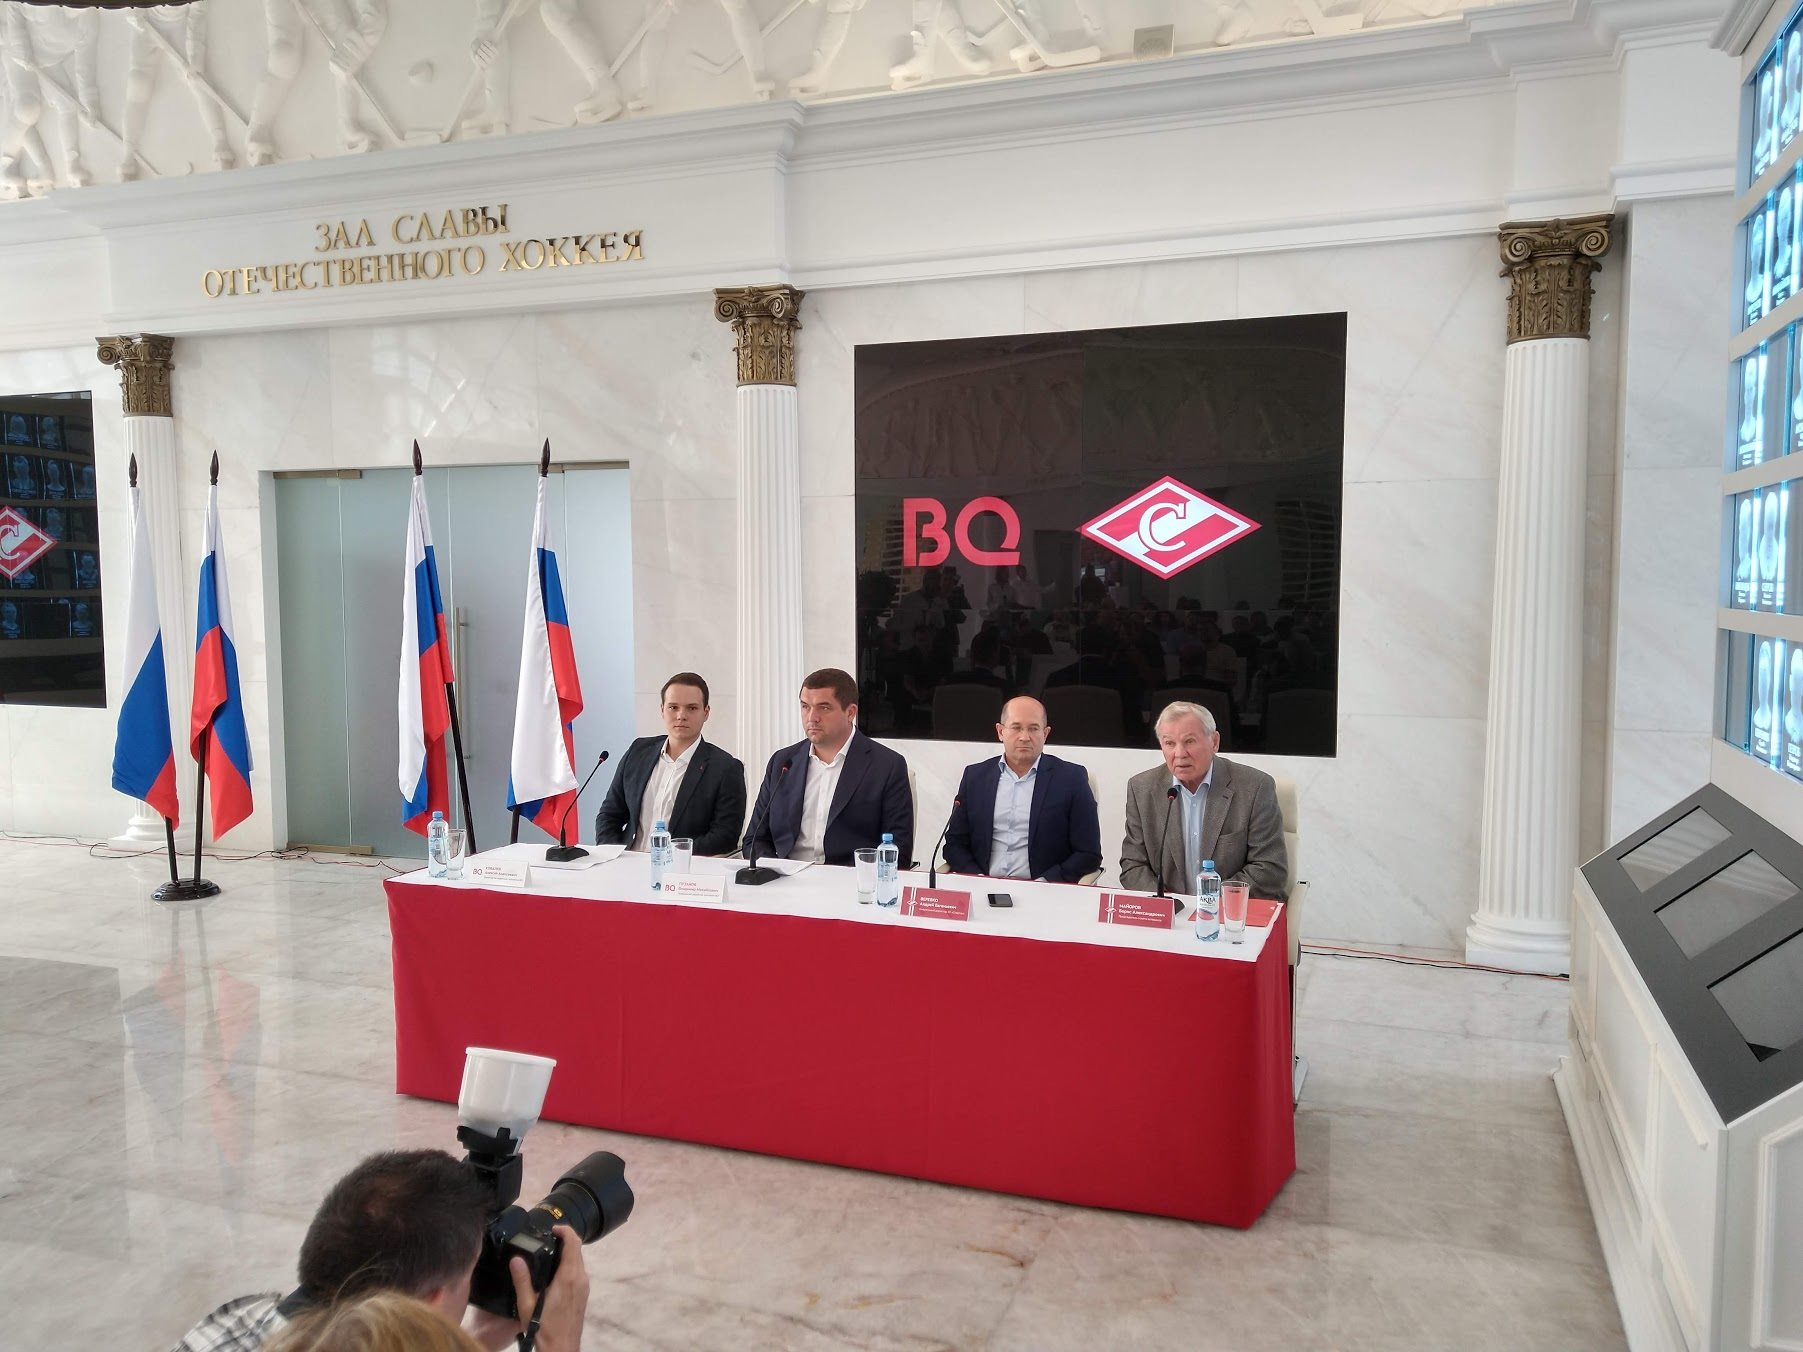 BQиХКСпартак объявили опартнёрстве